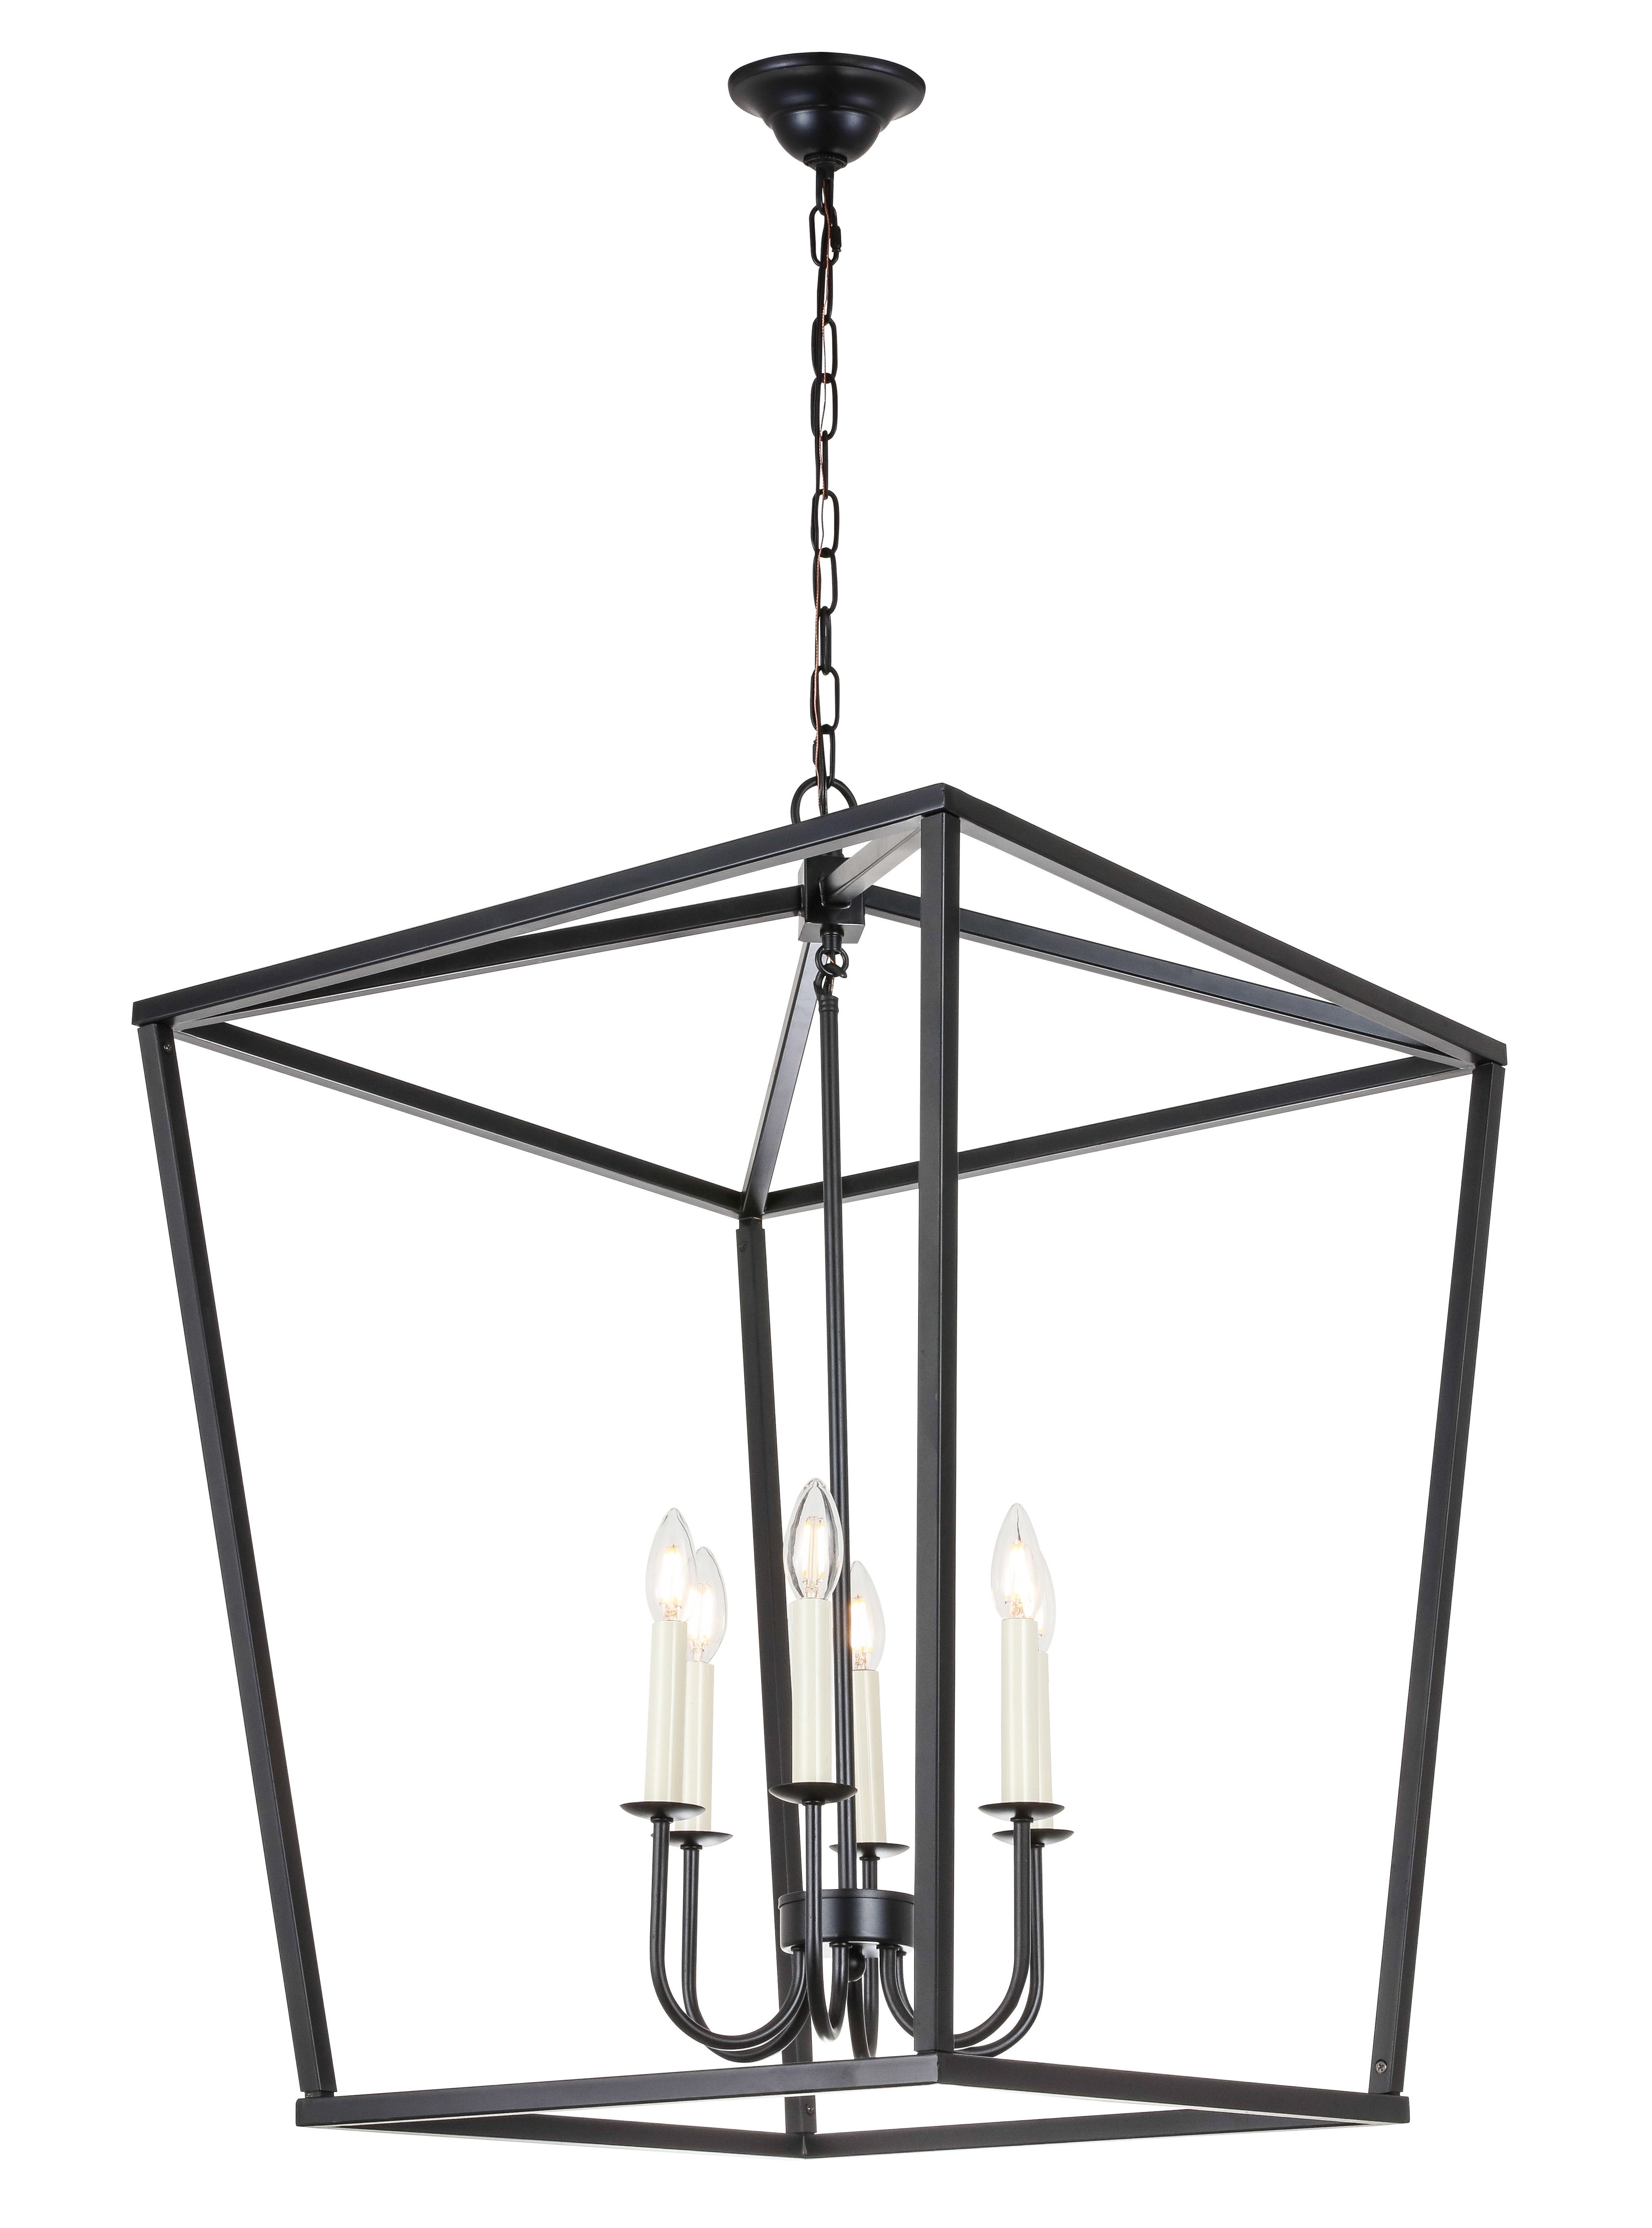 Best And Newest Tanguay 6 Light Lantern Pendant Throughout Carmen 6 Light Lantern Geometric Pendants (View 2 of 25)